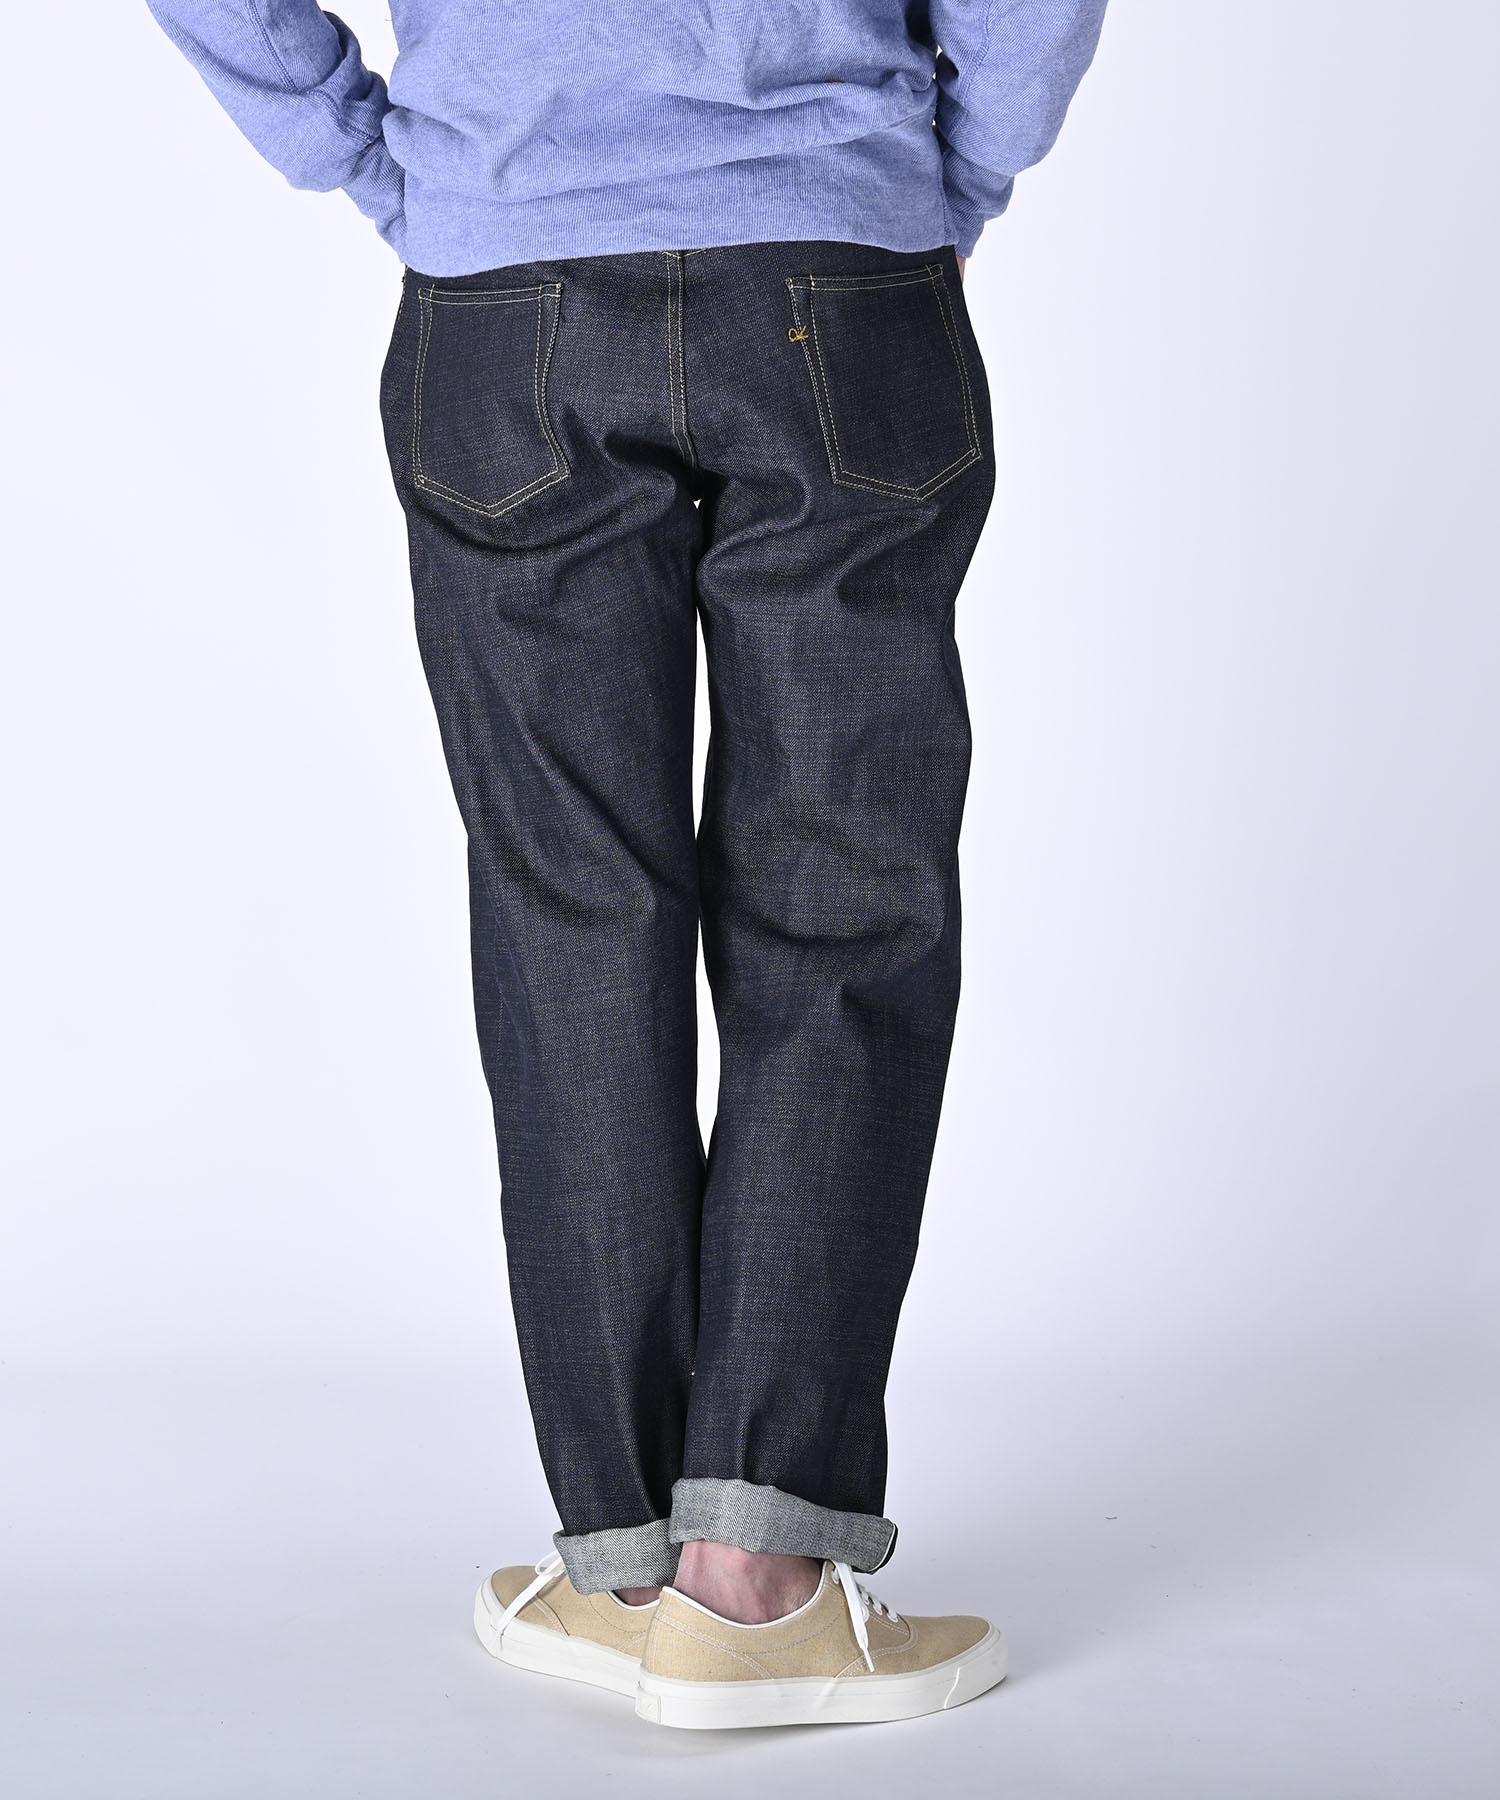 Futatabi 6.5 Sorahikohime Sanforized (0421)-5